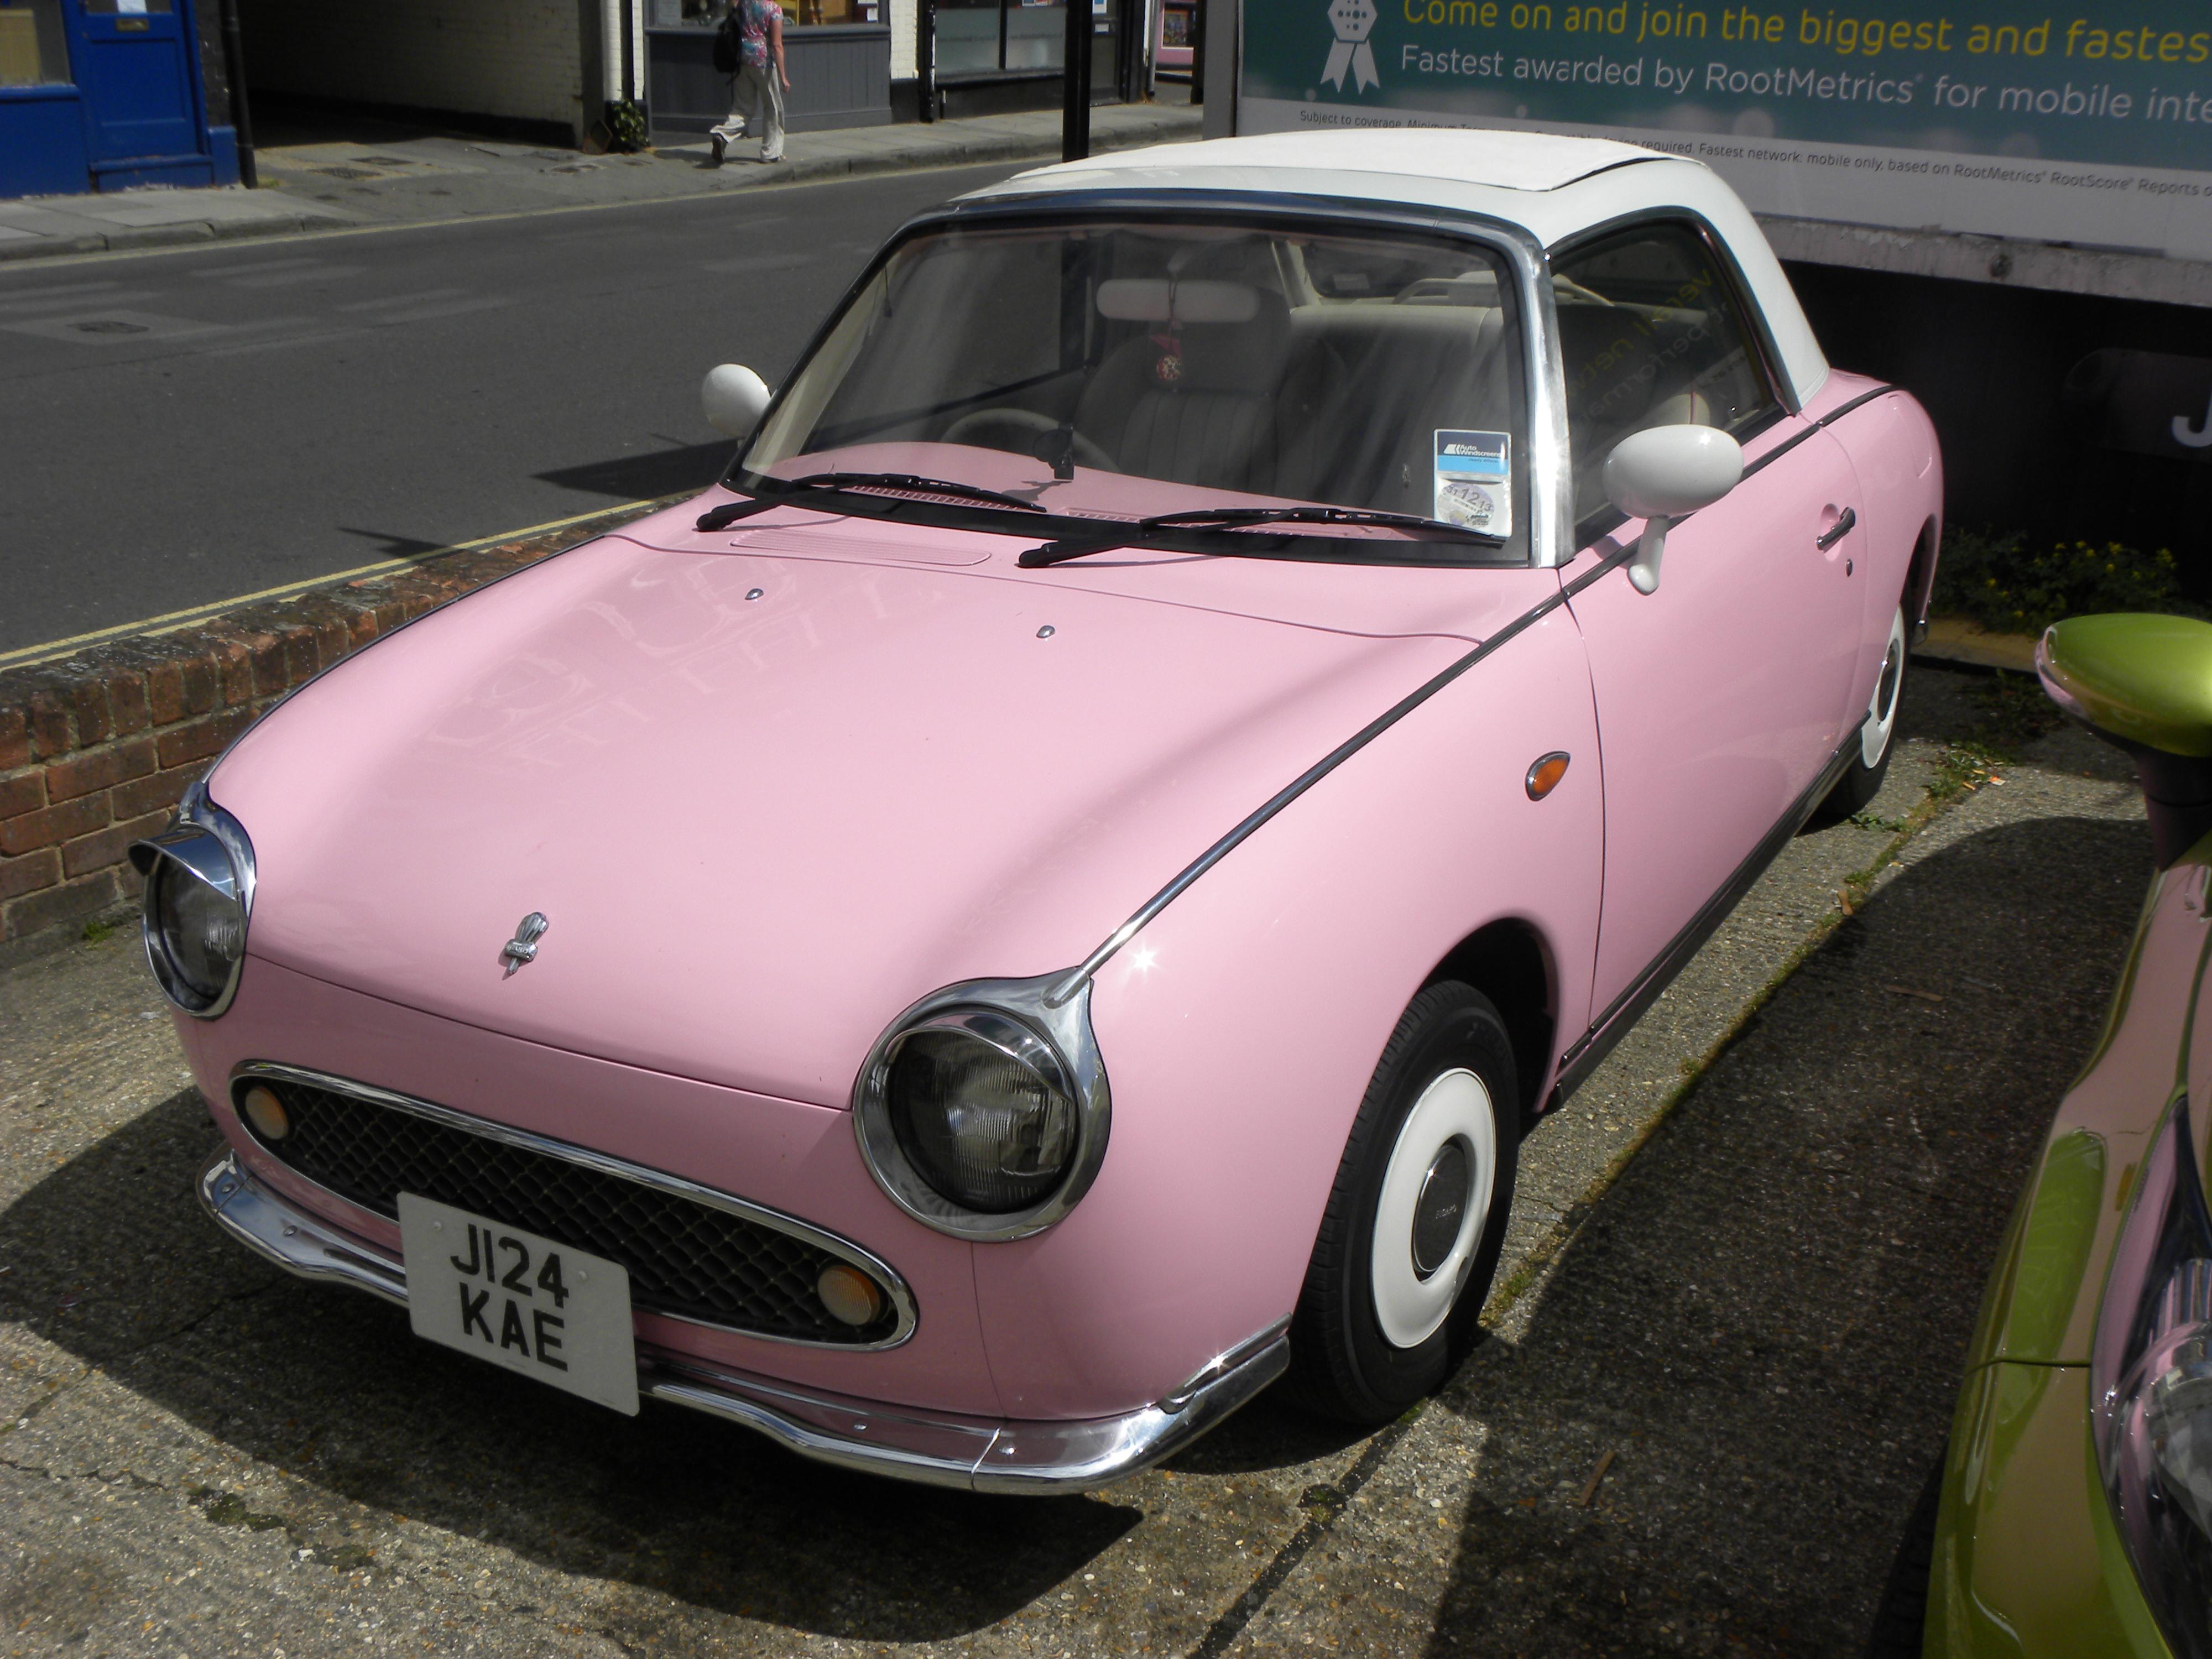 Nissan New Car Warranty